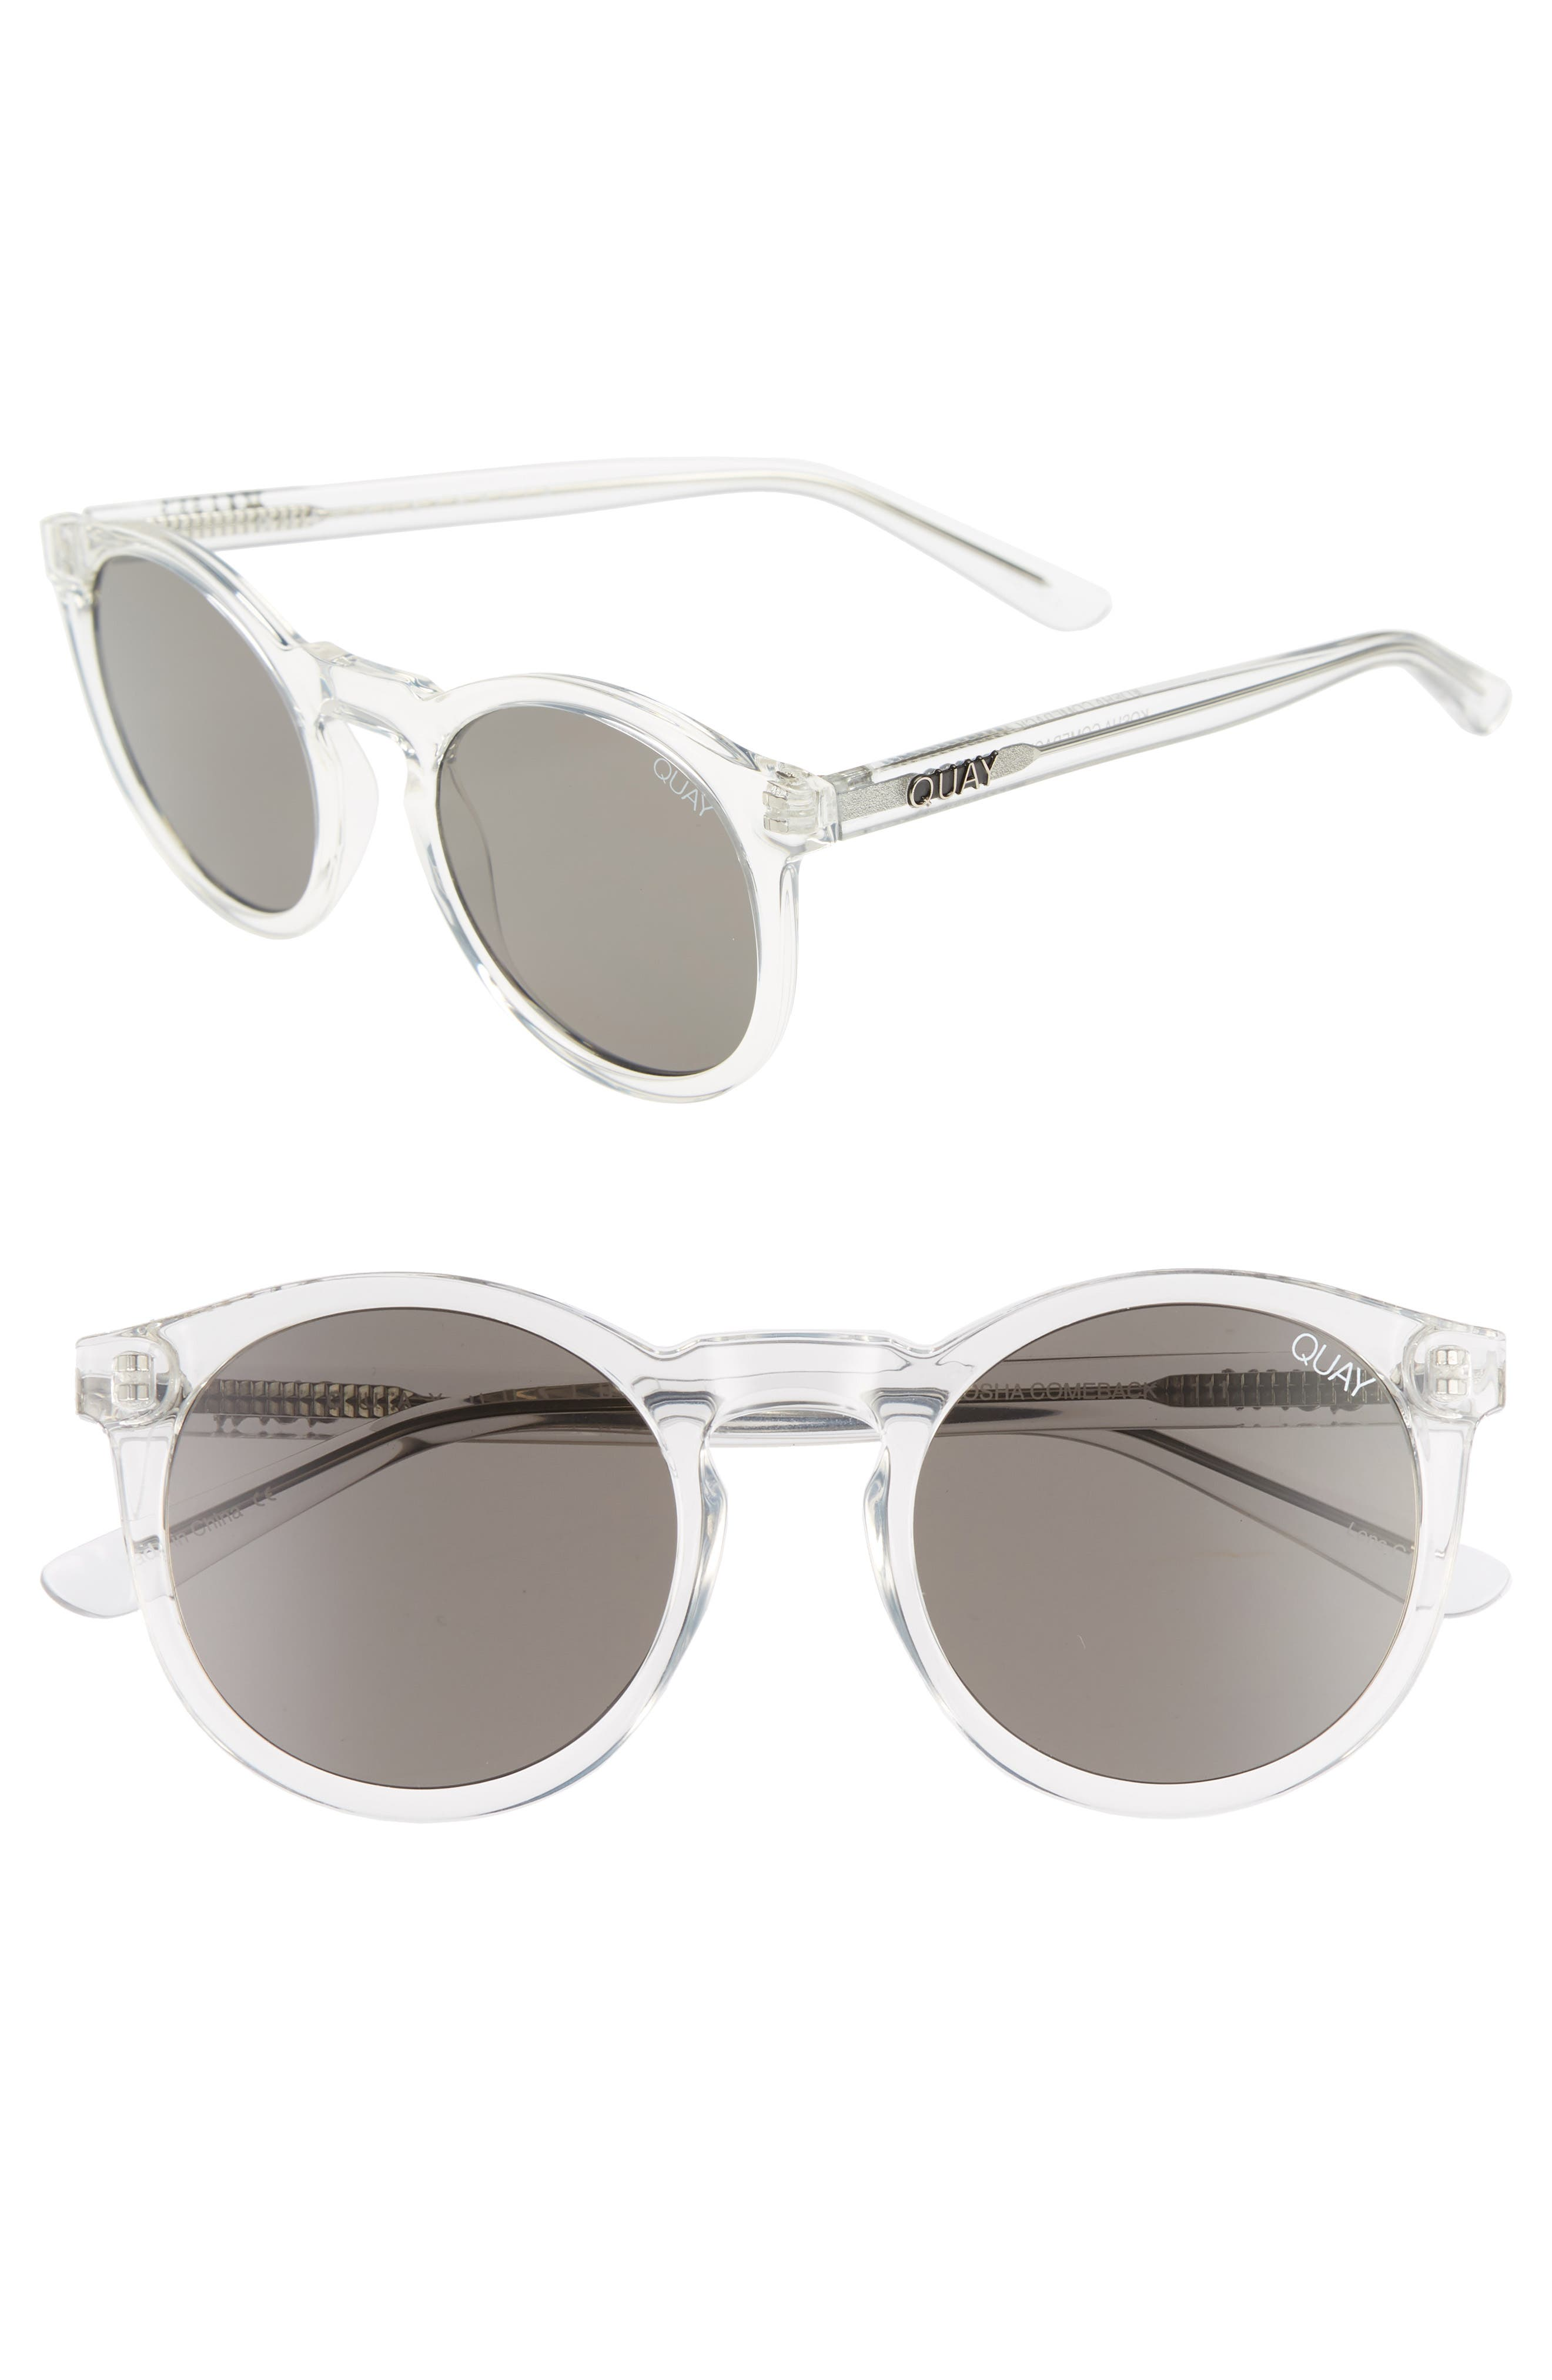 Kosha 49mm Round Sunglasses,                             Main thumbnail 1, color,